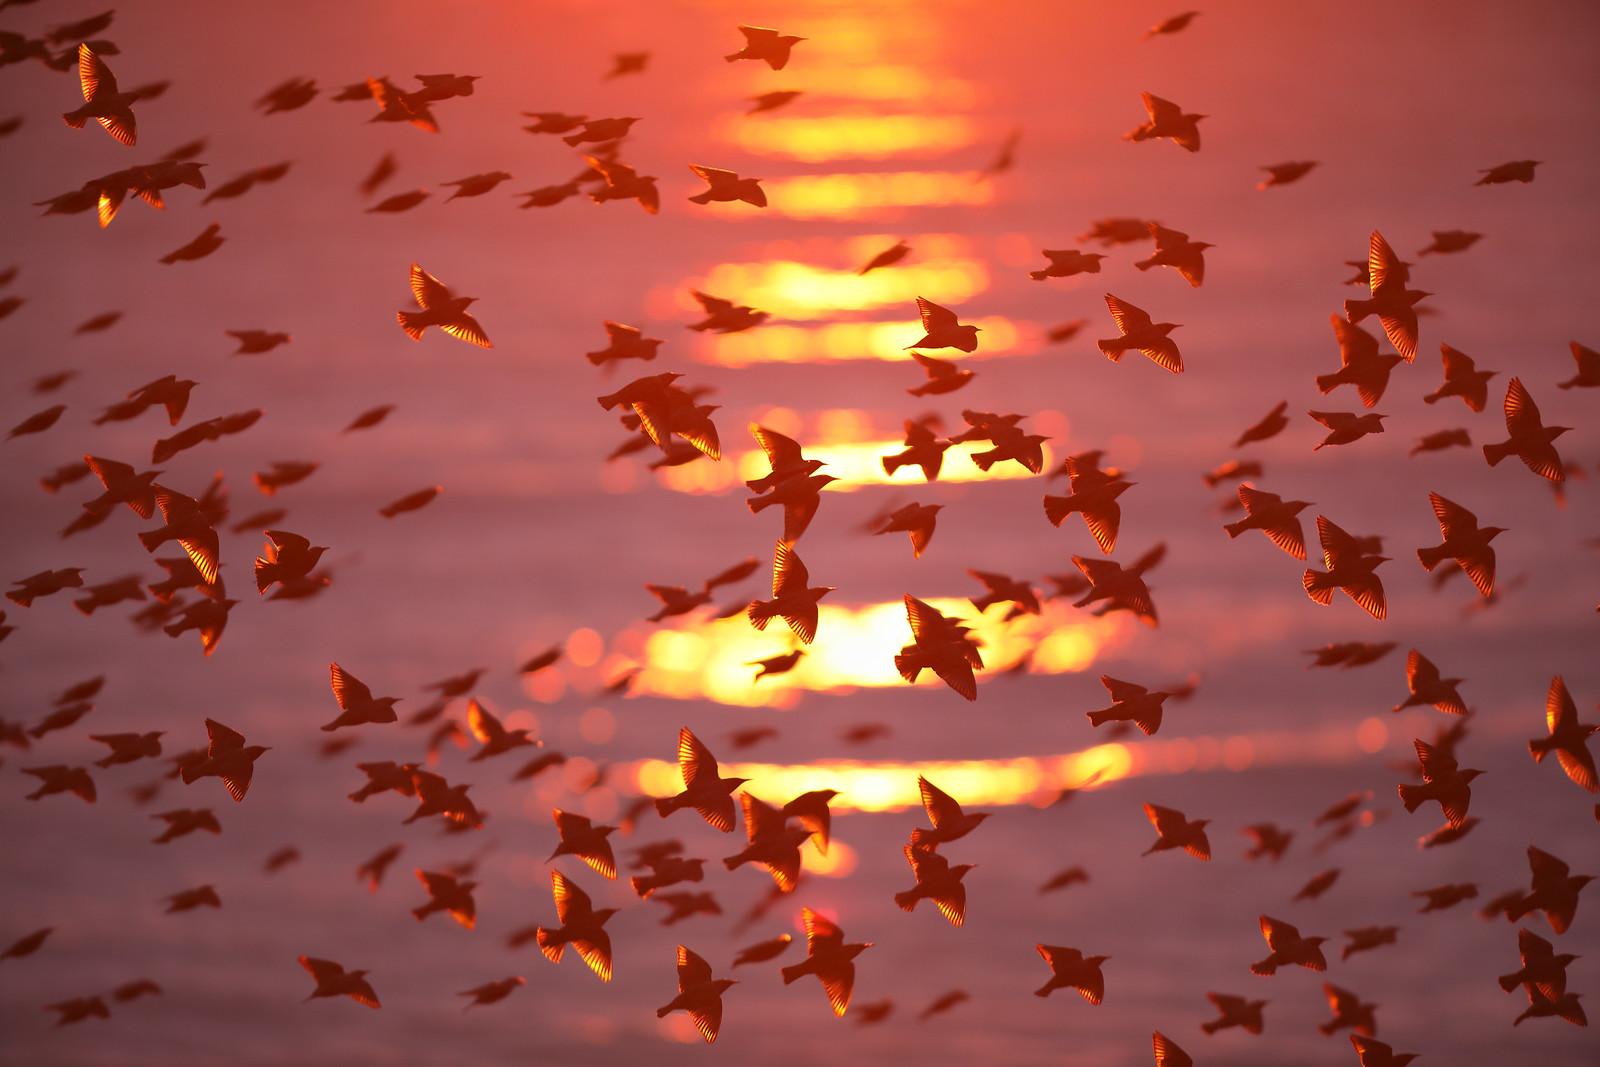 Iridescent Starling Murmuration at Sunset